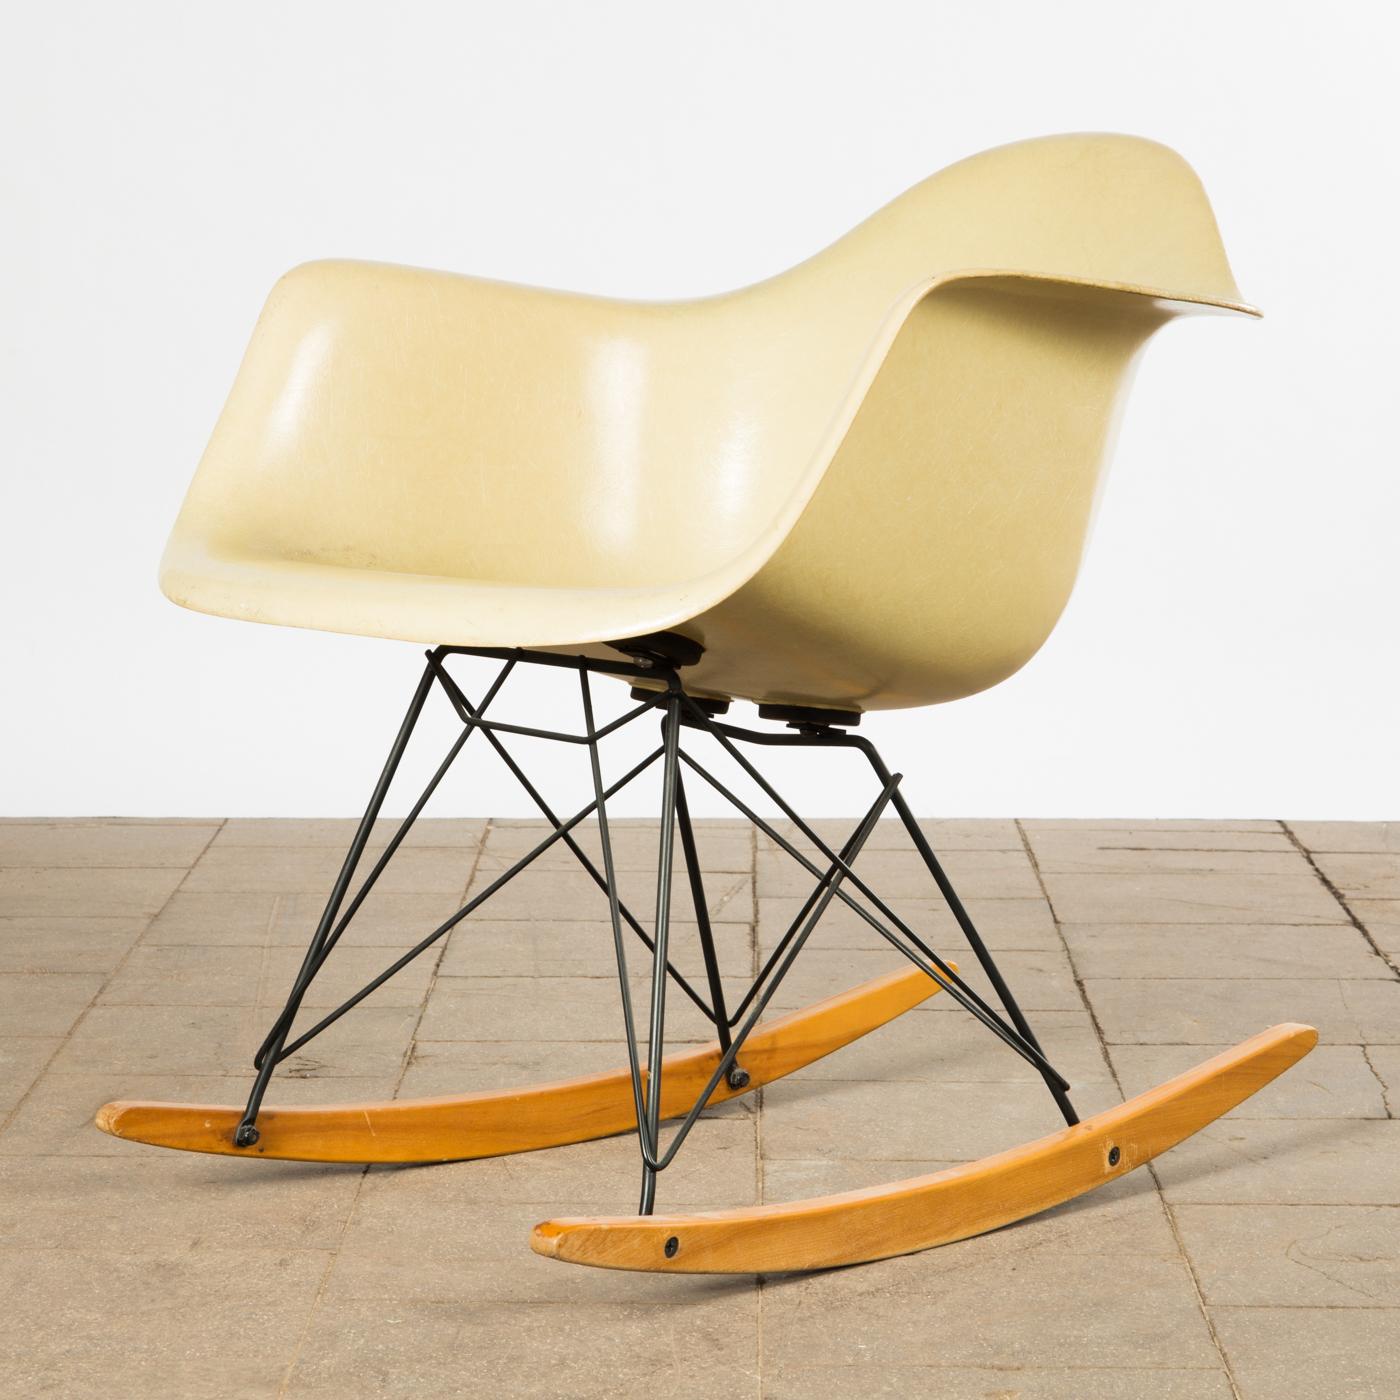 Fantastisch Ray U0026 Charles Eames, A Rocking Chair, Rocker RAR, 2. Series By Zenith  Plastics | Lauritz.com